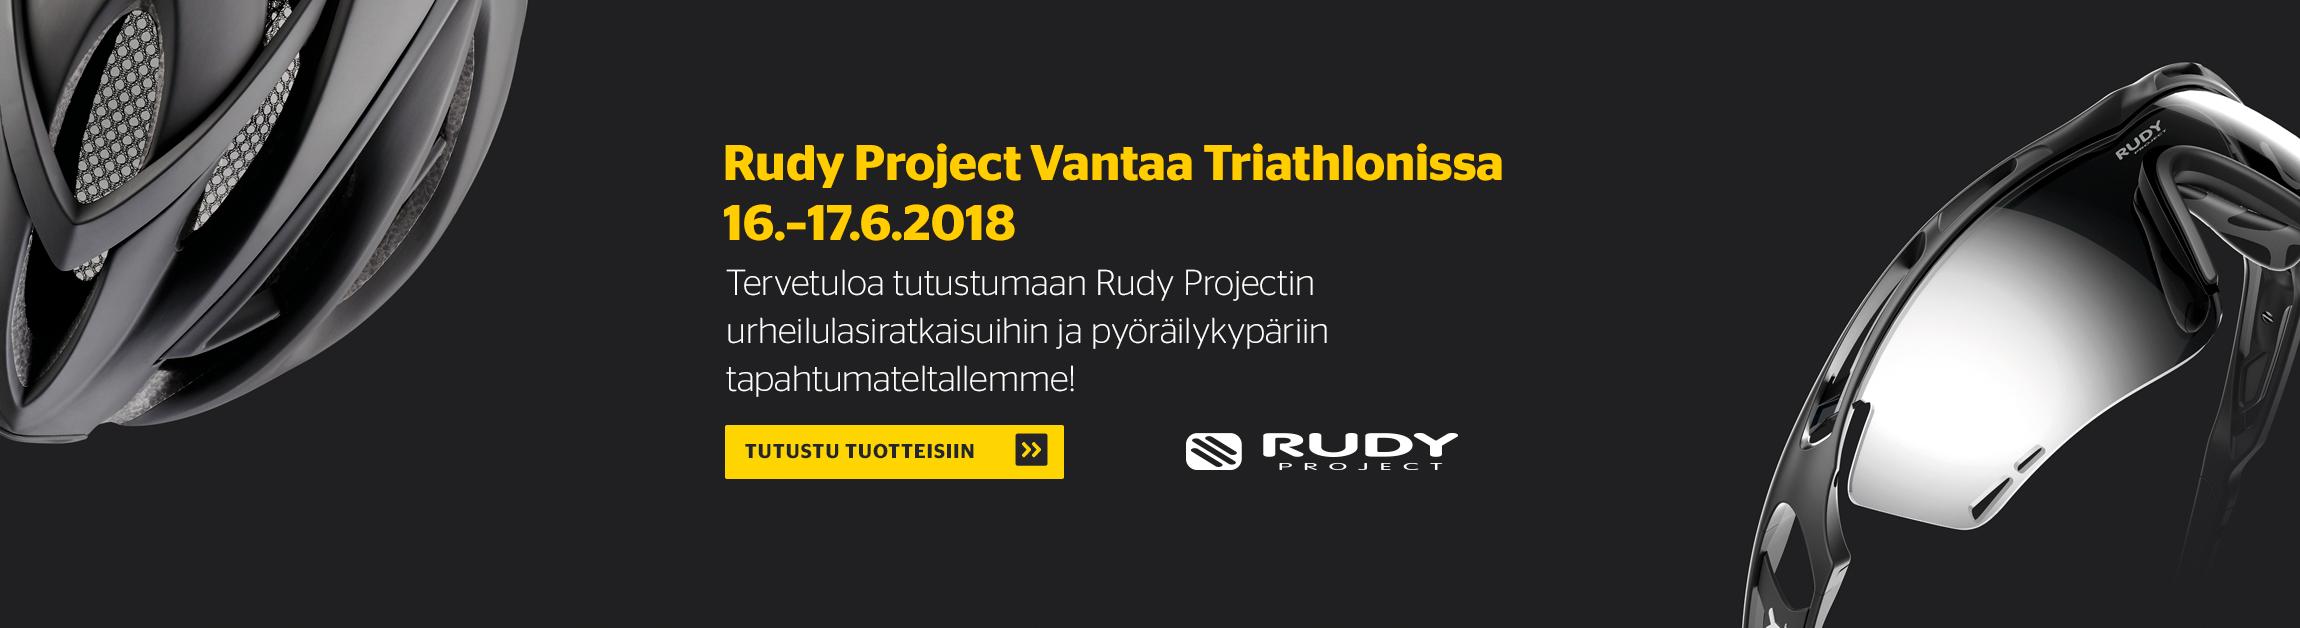 OJcom_RUDY_VantaaTRI_etusivu_2300x628